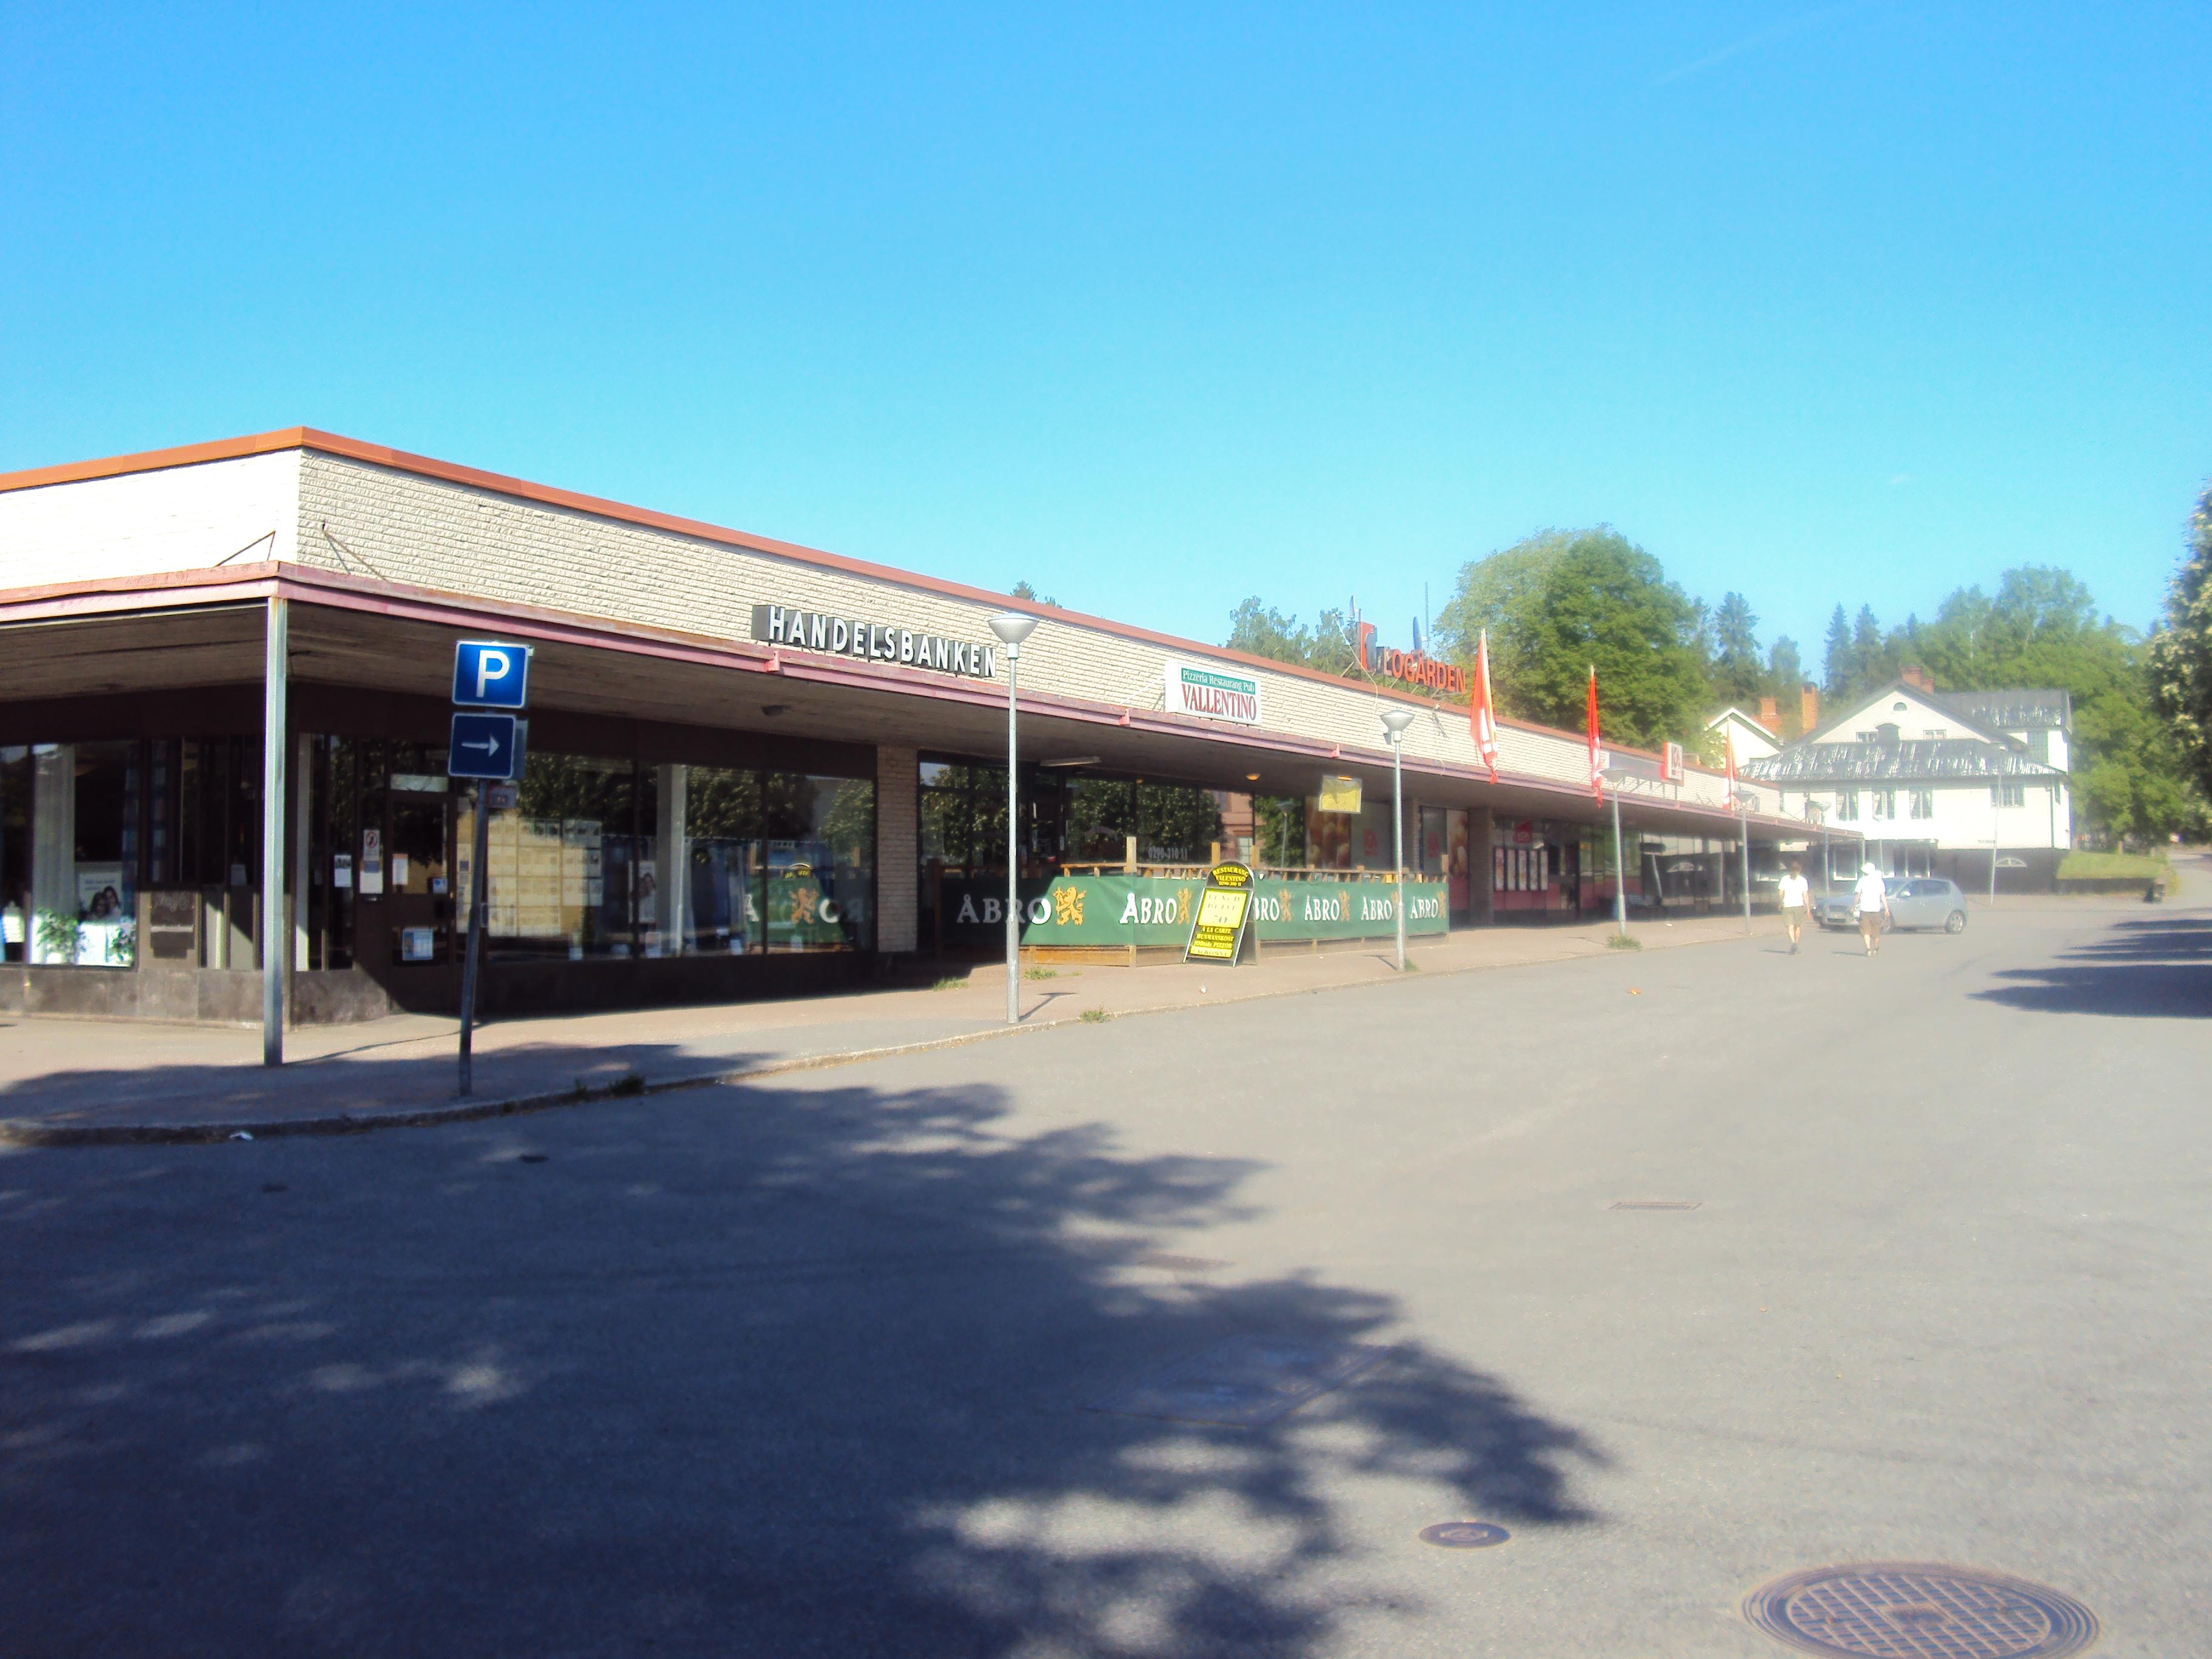 Gustafsngs Trdgrd, Map, Shops, Storvik   Visit Gvle